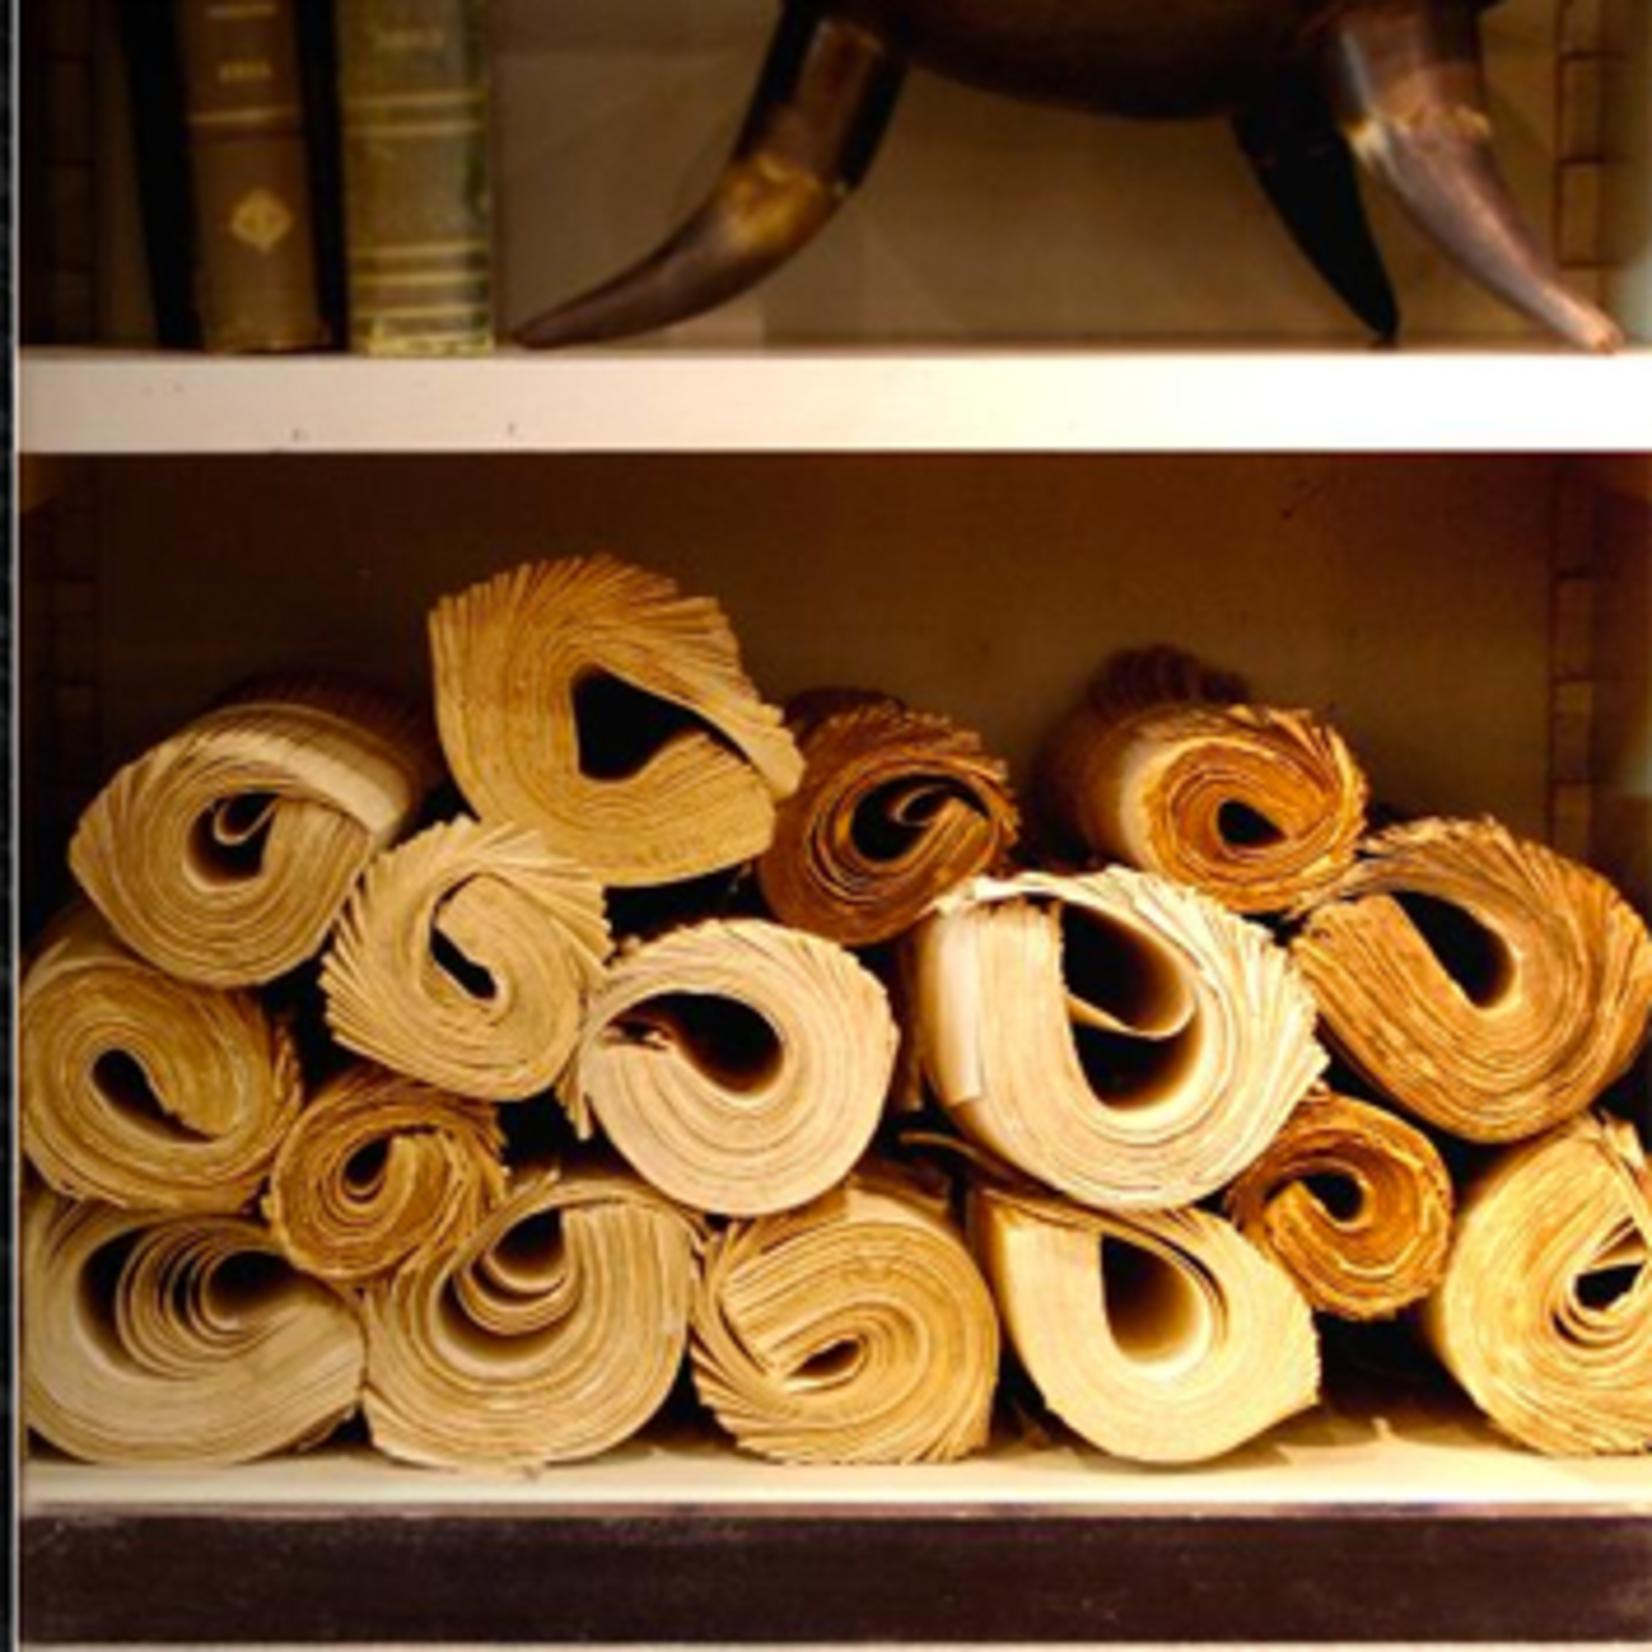 OBJET DE CURIOSITE Rolls of books Each